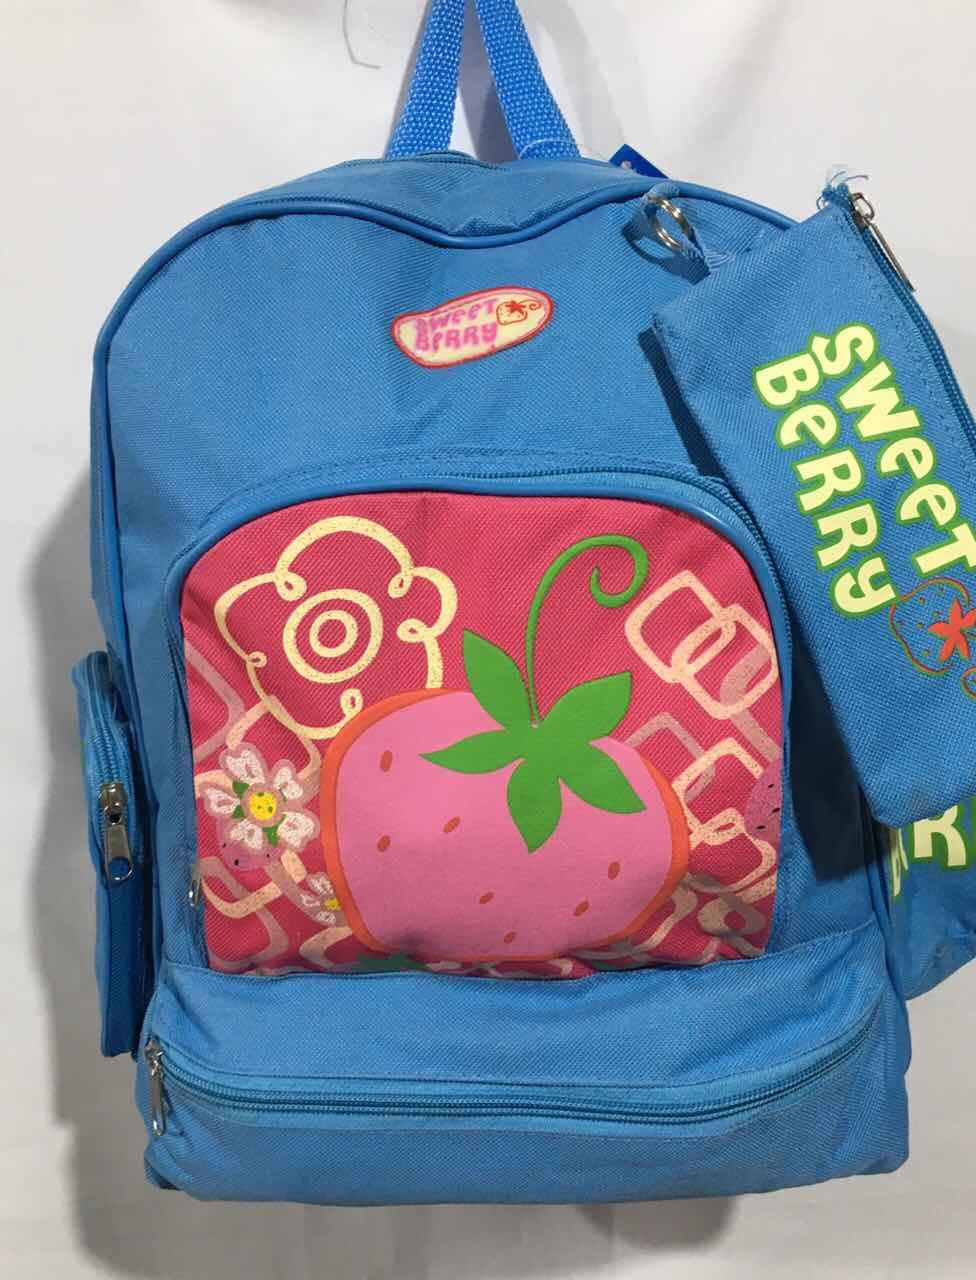 Рюкзак для девочки с сумочкой Клубничка (40х31)